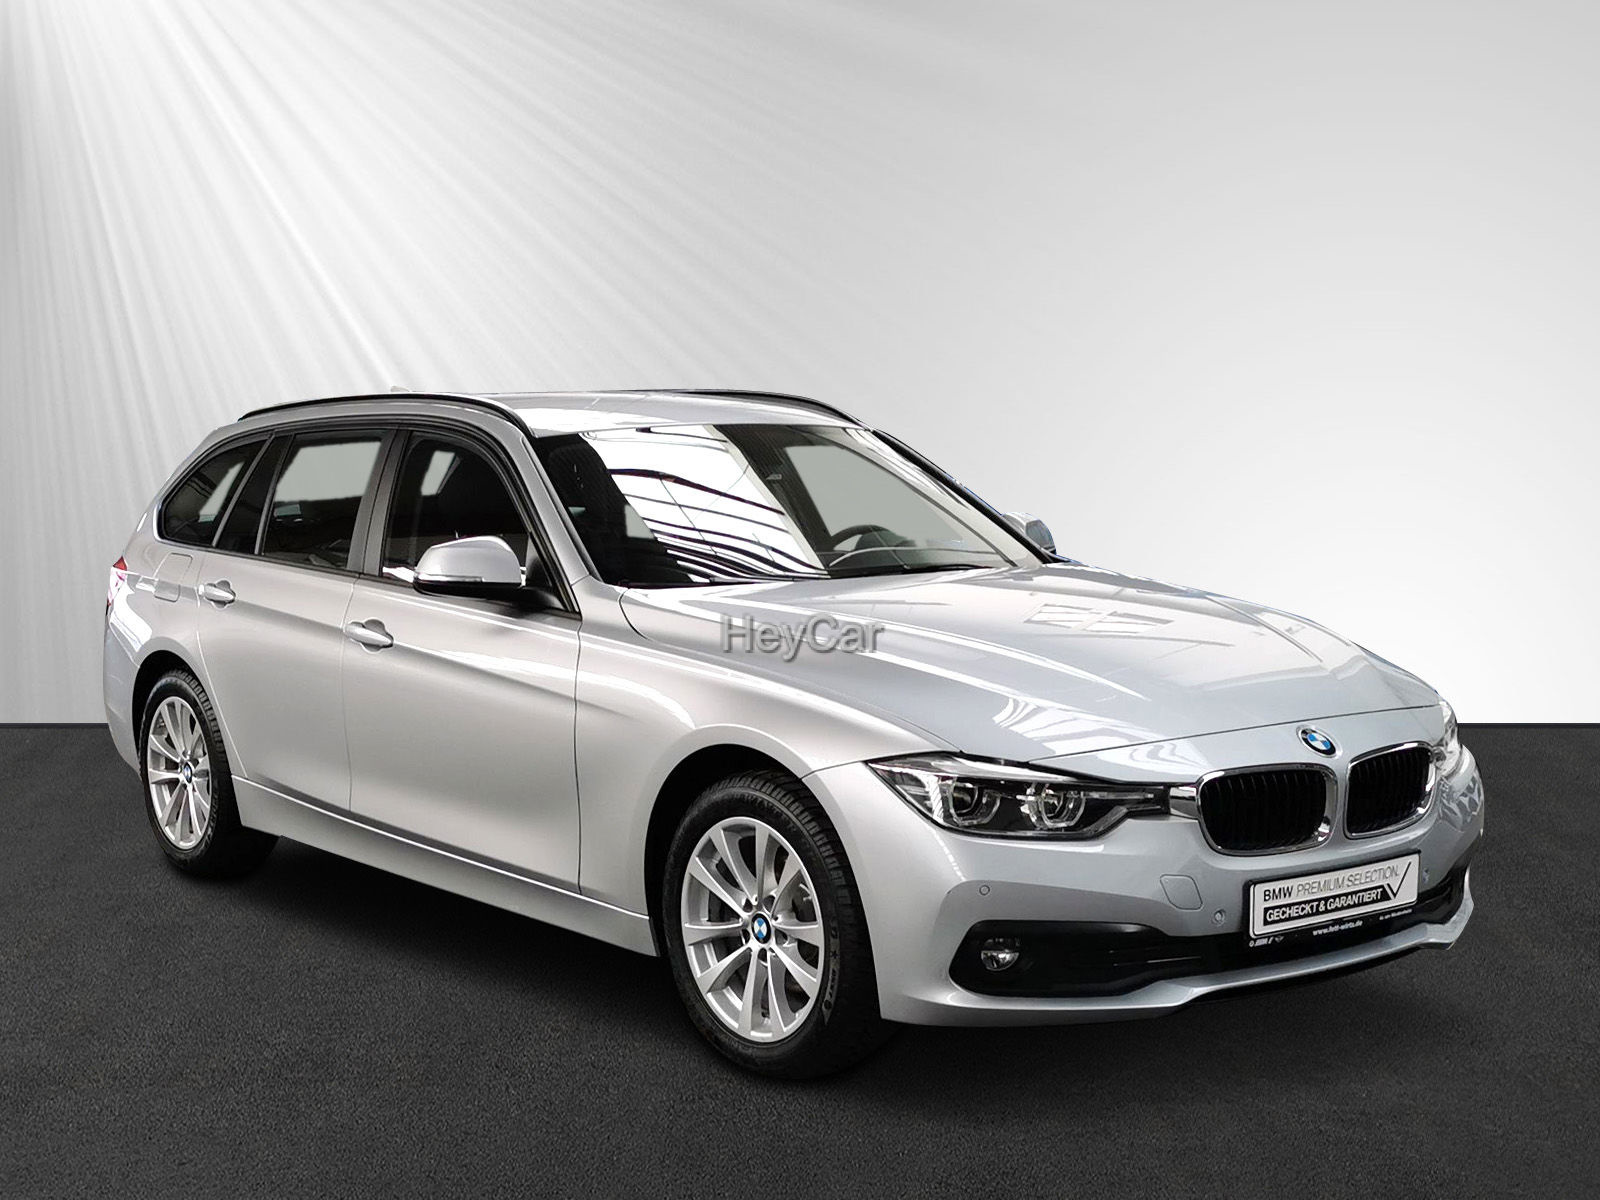 BMW 316d Touring Navi LED Klimaaut. Sitzhz PDC v./h., Jahr 2018, Diesel